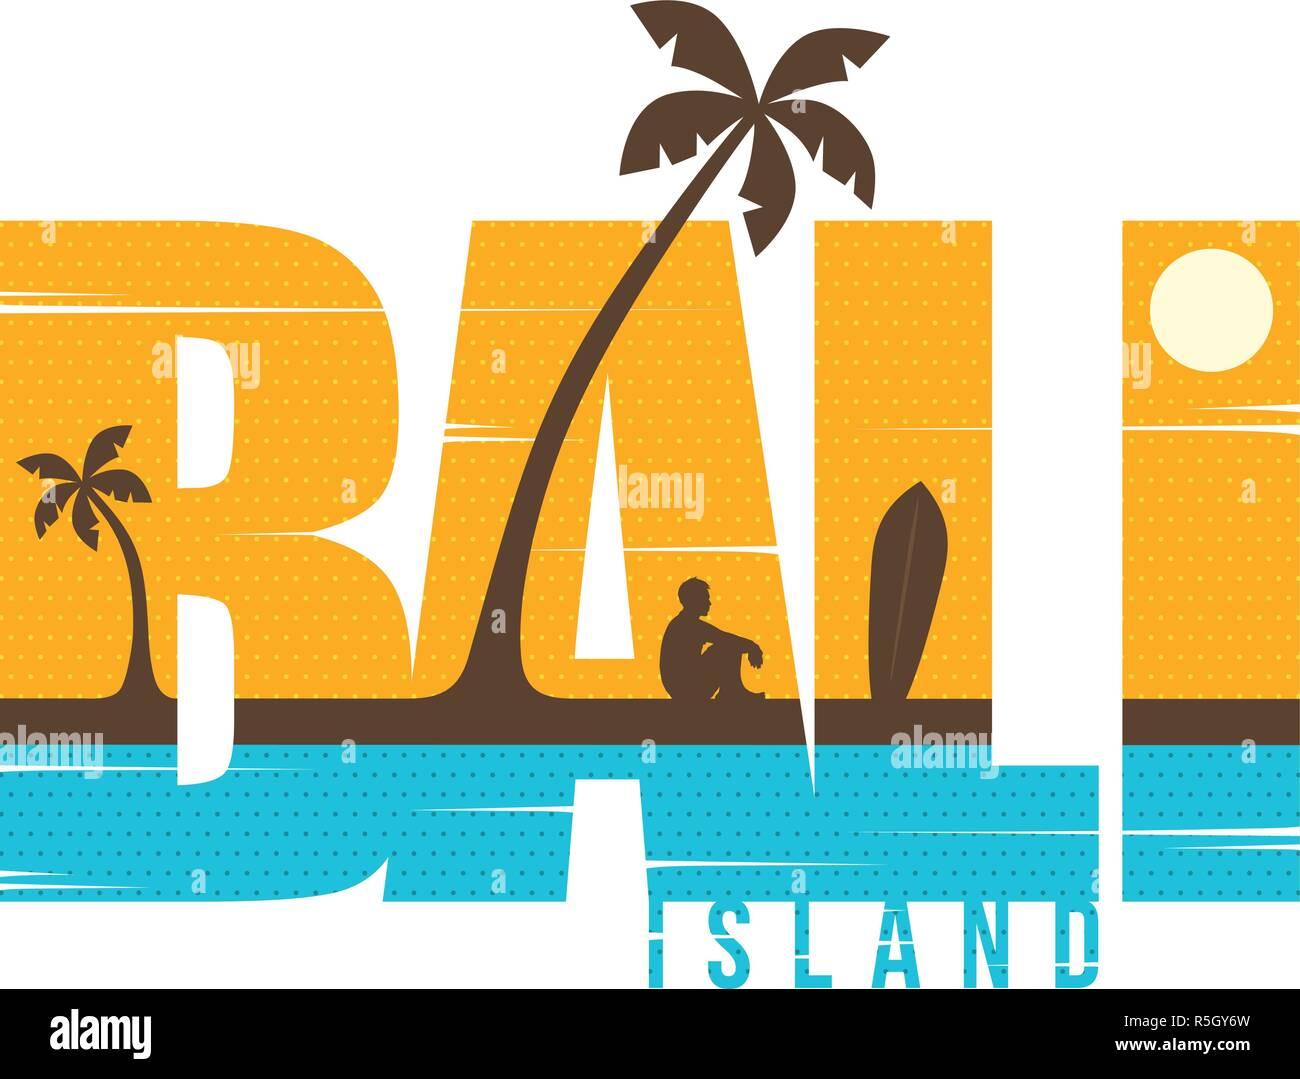 Bali Island Summer Holidays Beach Sign Symbol Vector Art Stock